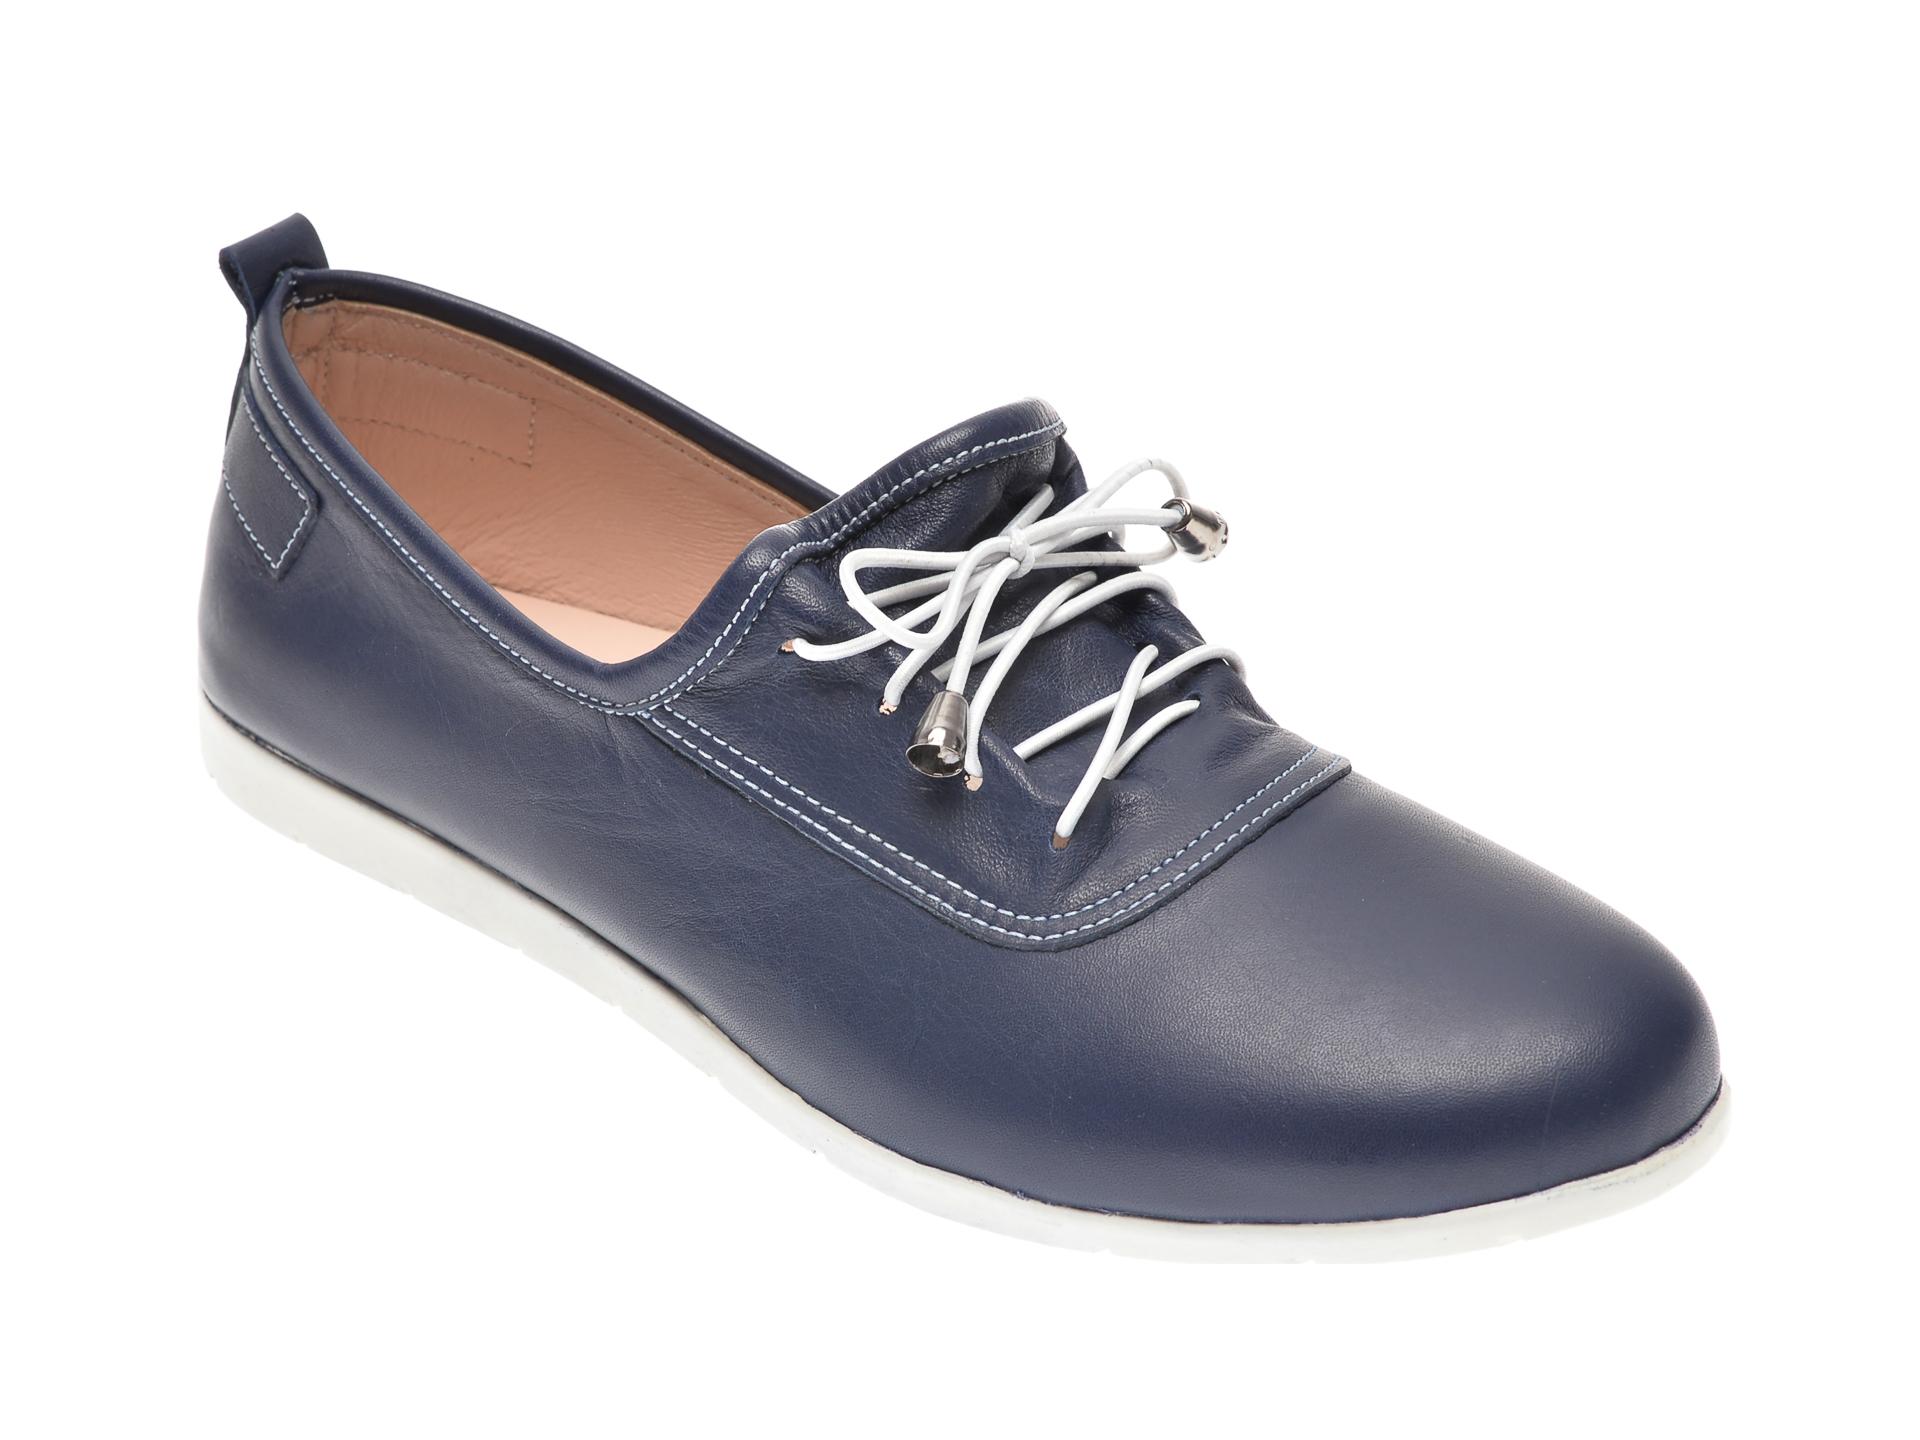 Pantofi ECLIPSE bleumarin, 408, din piele naturala imagine